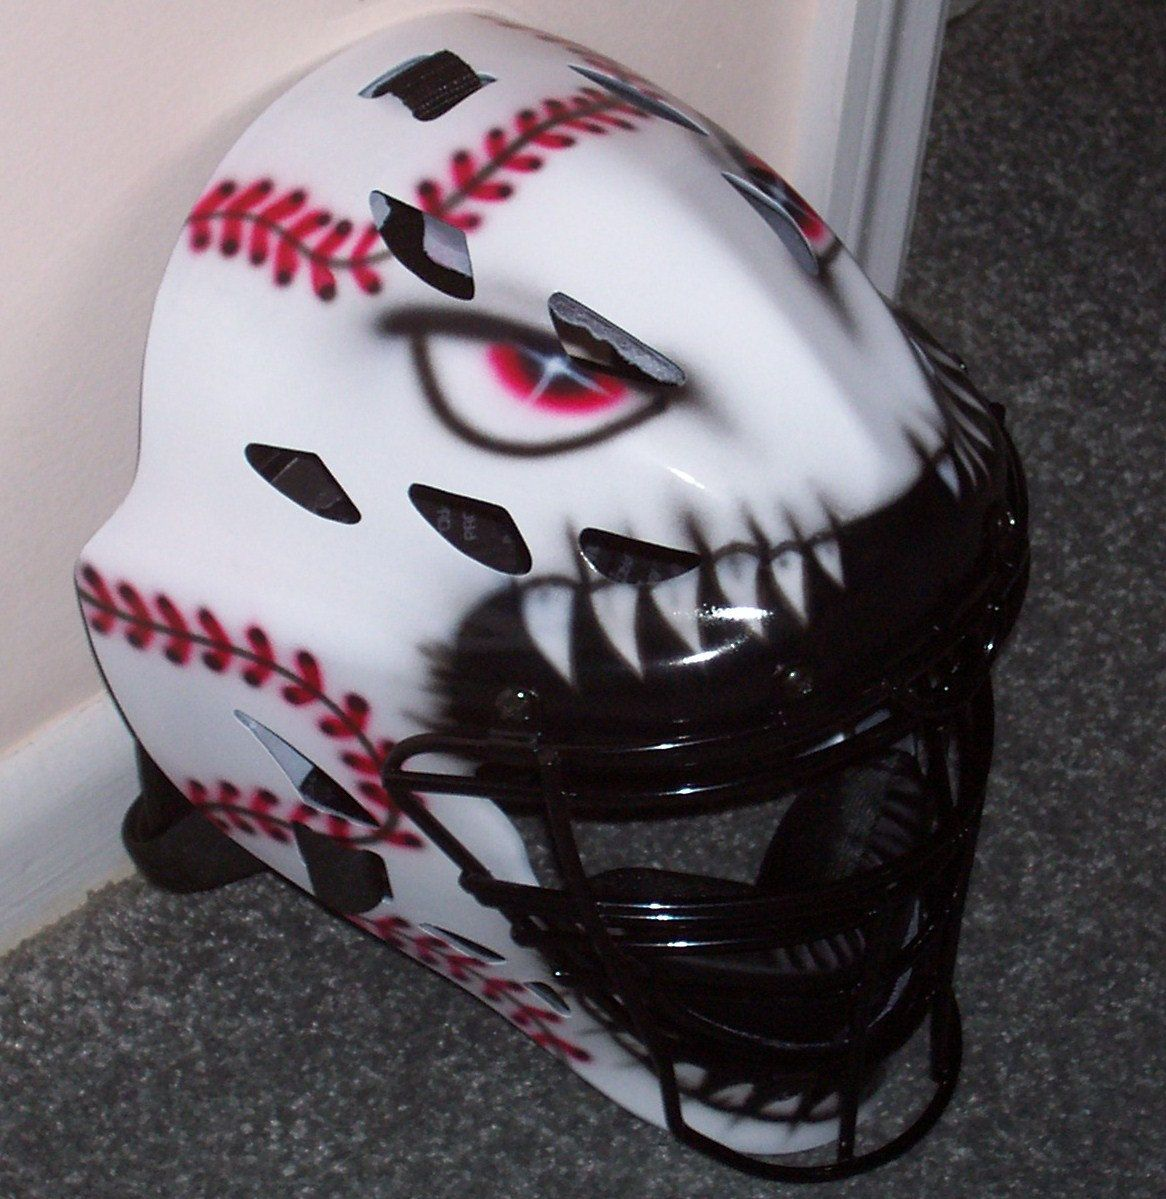 Baseball catchers gear baseball catchers gear set - Catchers Helmet Airbrush Baseball